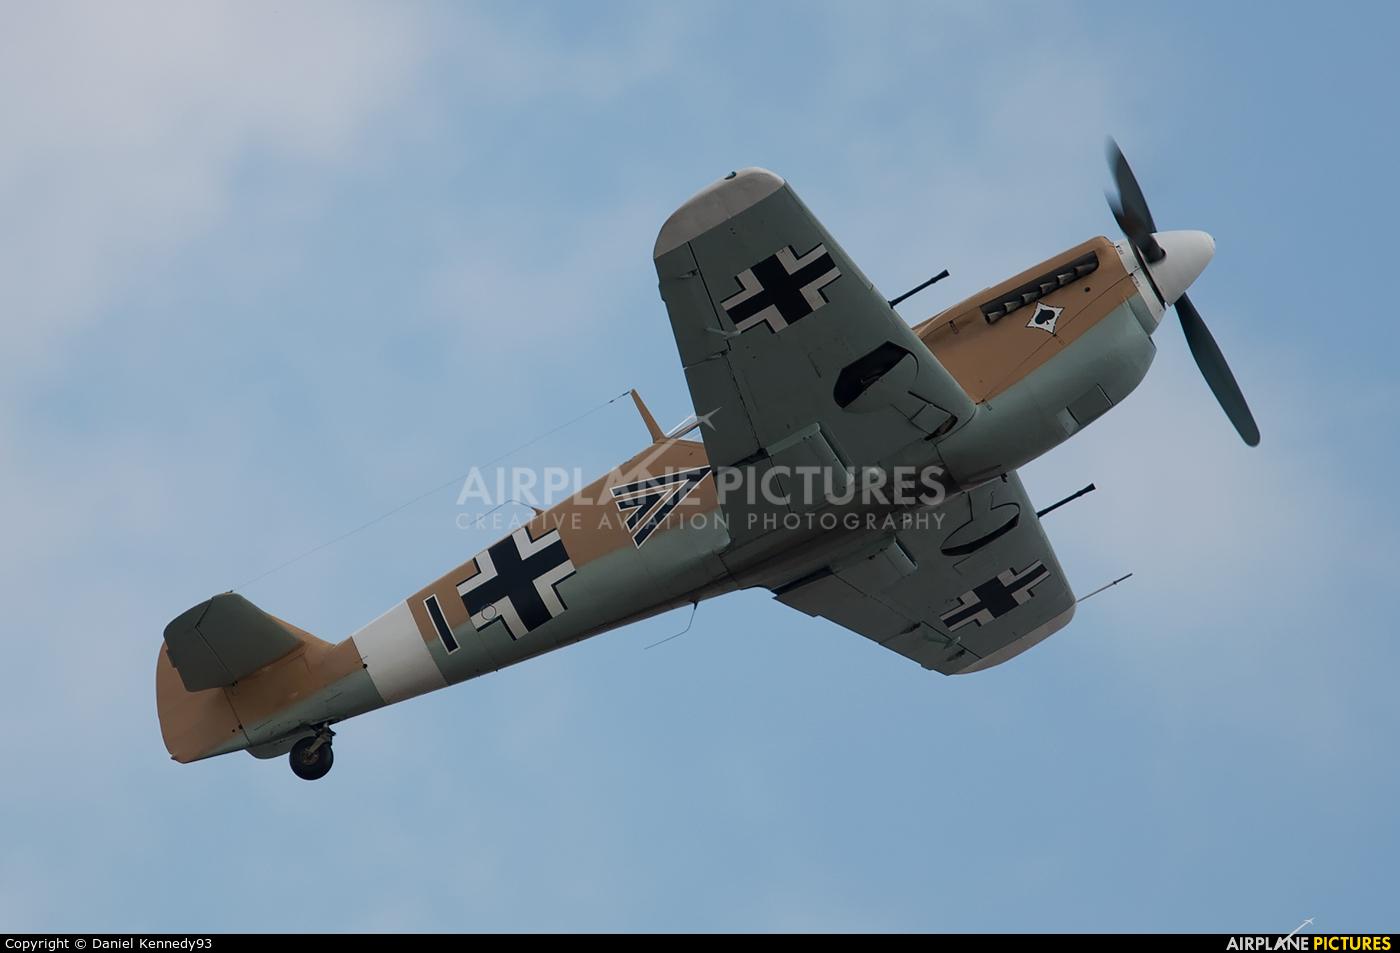 Private - aircraft at Cleethorpes